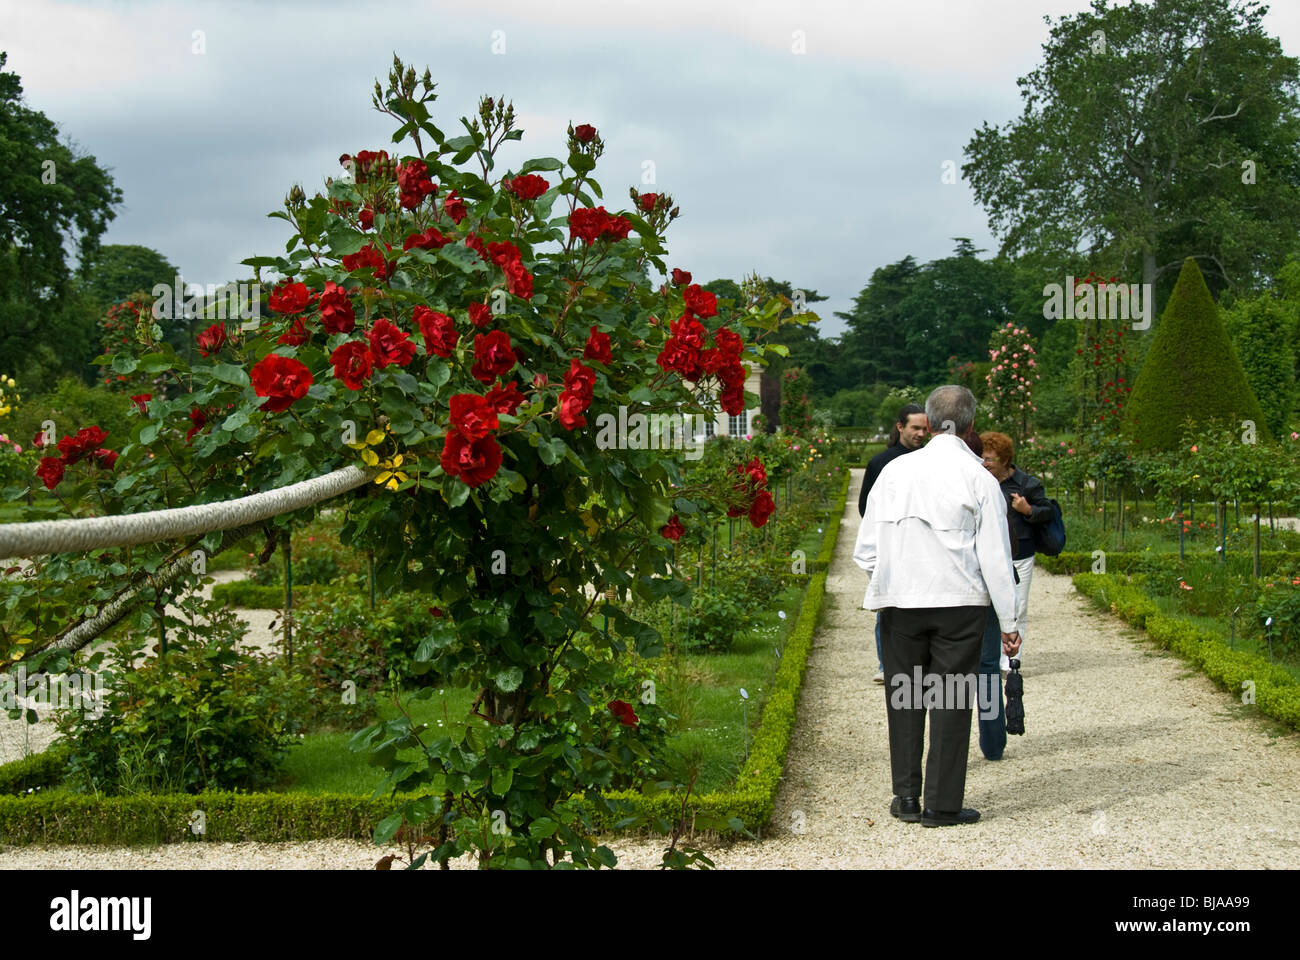 Paris, France, Public Parks, Group of People Visiting Bagatelle Rose Garden in Boulogne Park, - Stock Image